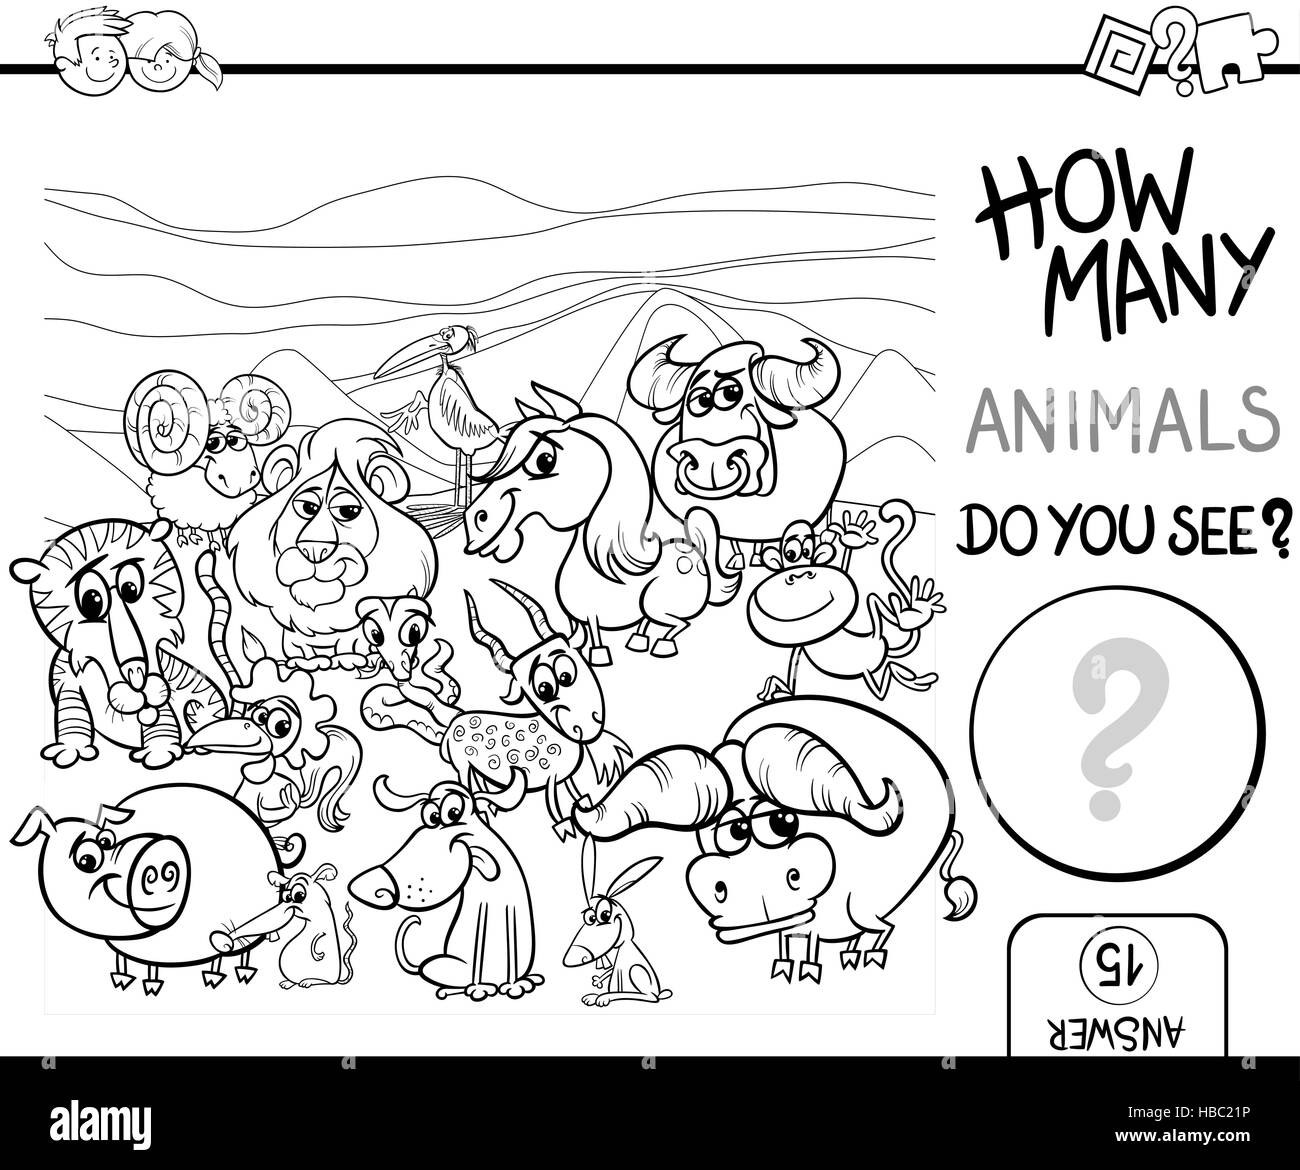 Black And White Cartoon Illustration Of Educational